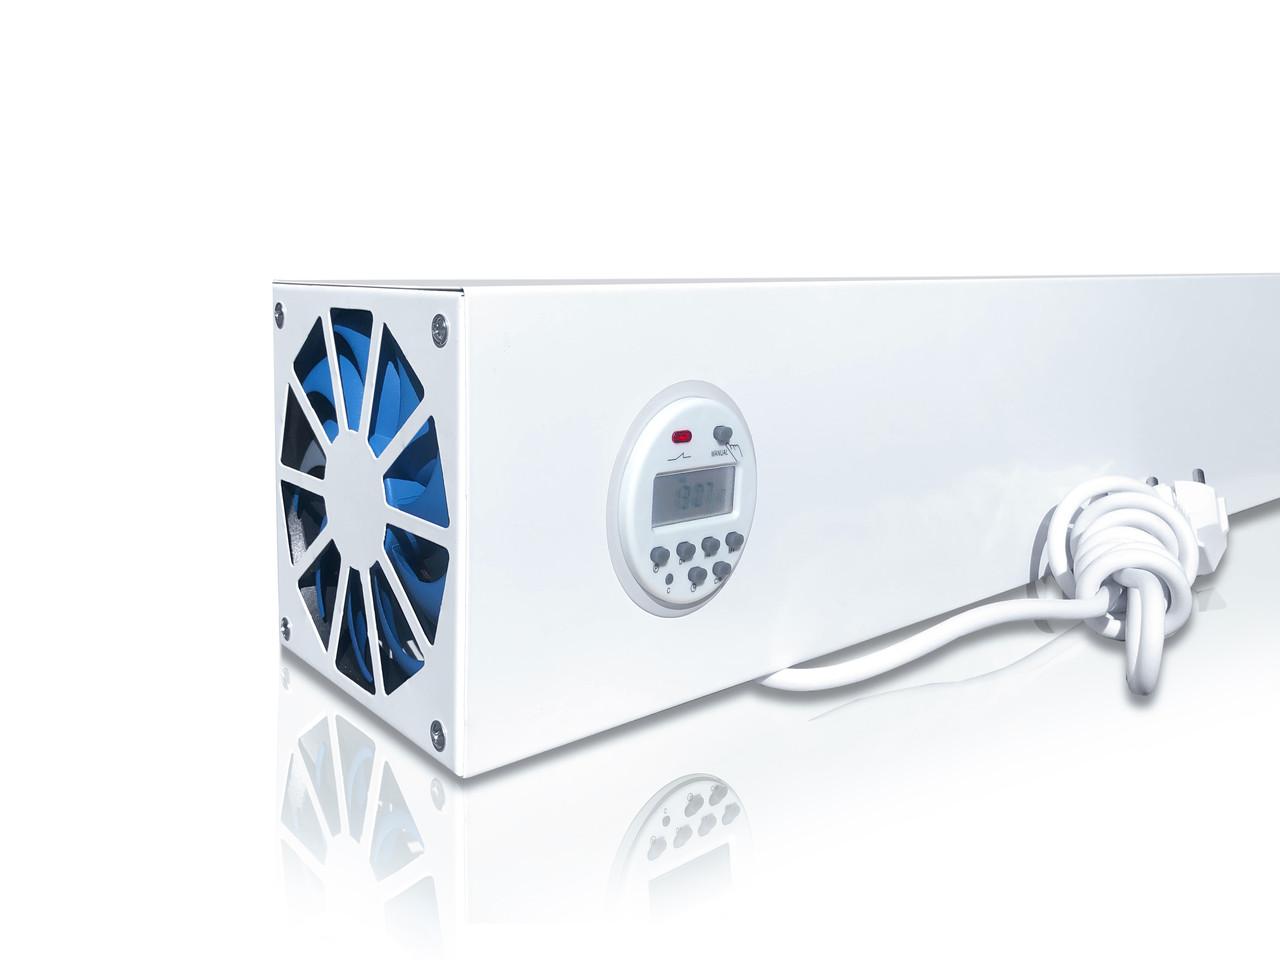 Бактерицидный рециркулятор воздуха MEDPROFI 60 Вт + Таймер